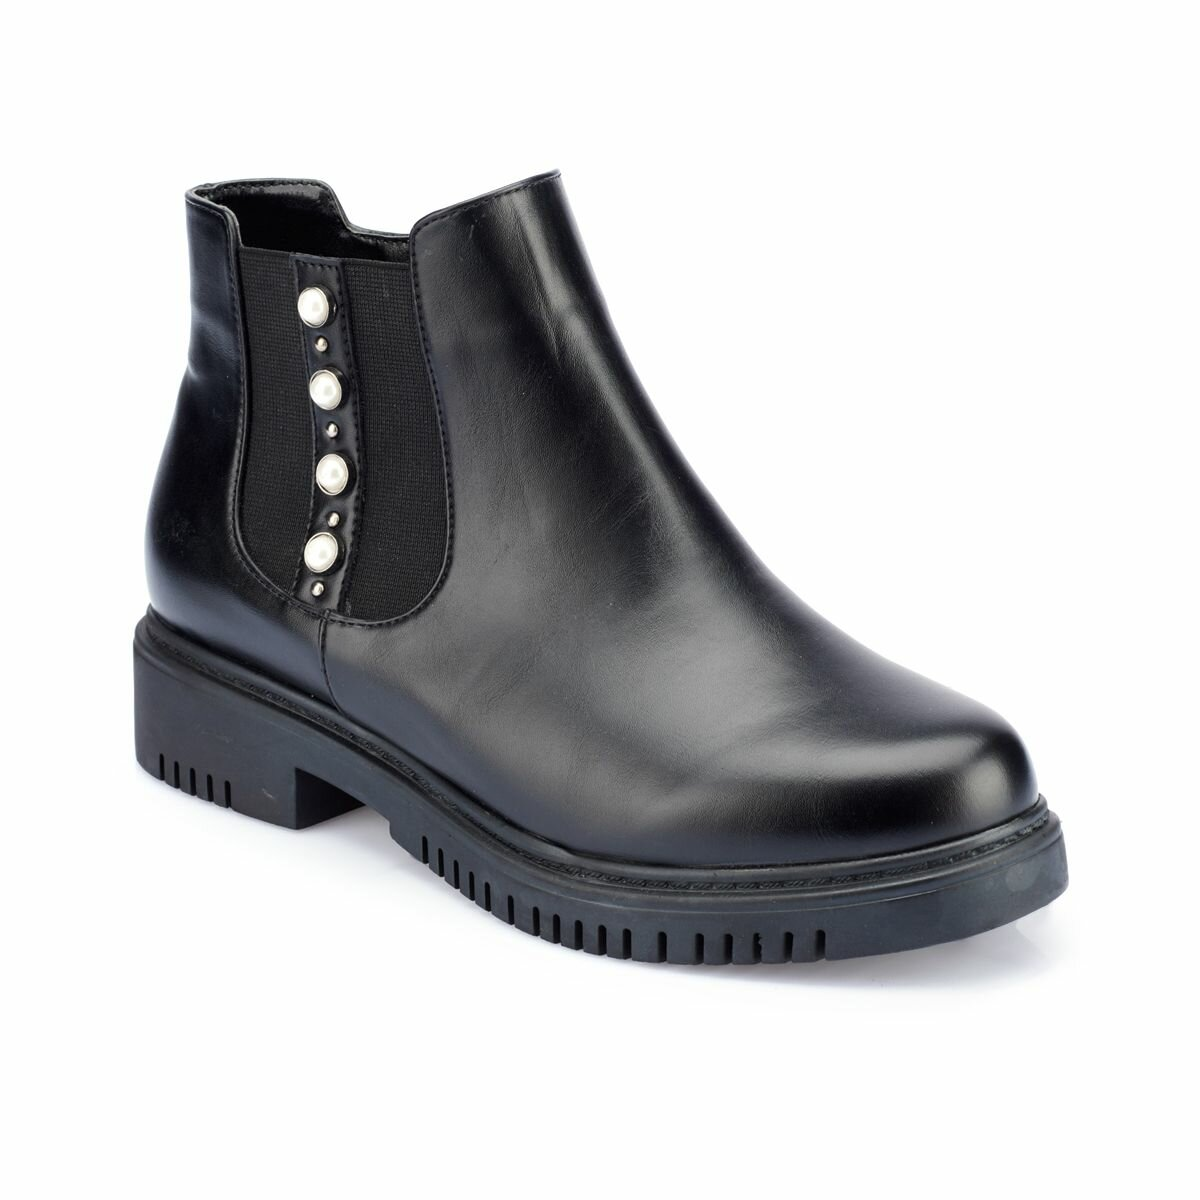 FLO 82.312307.Z Black Women Boots Polaris